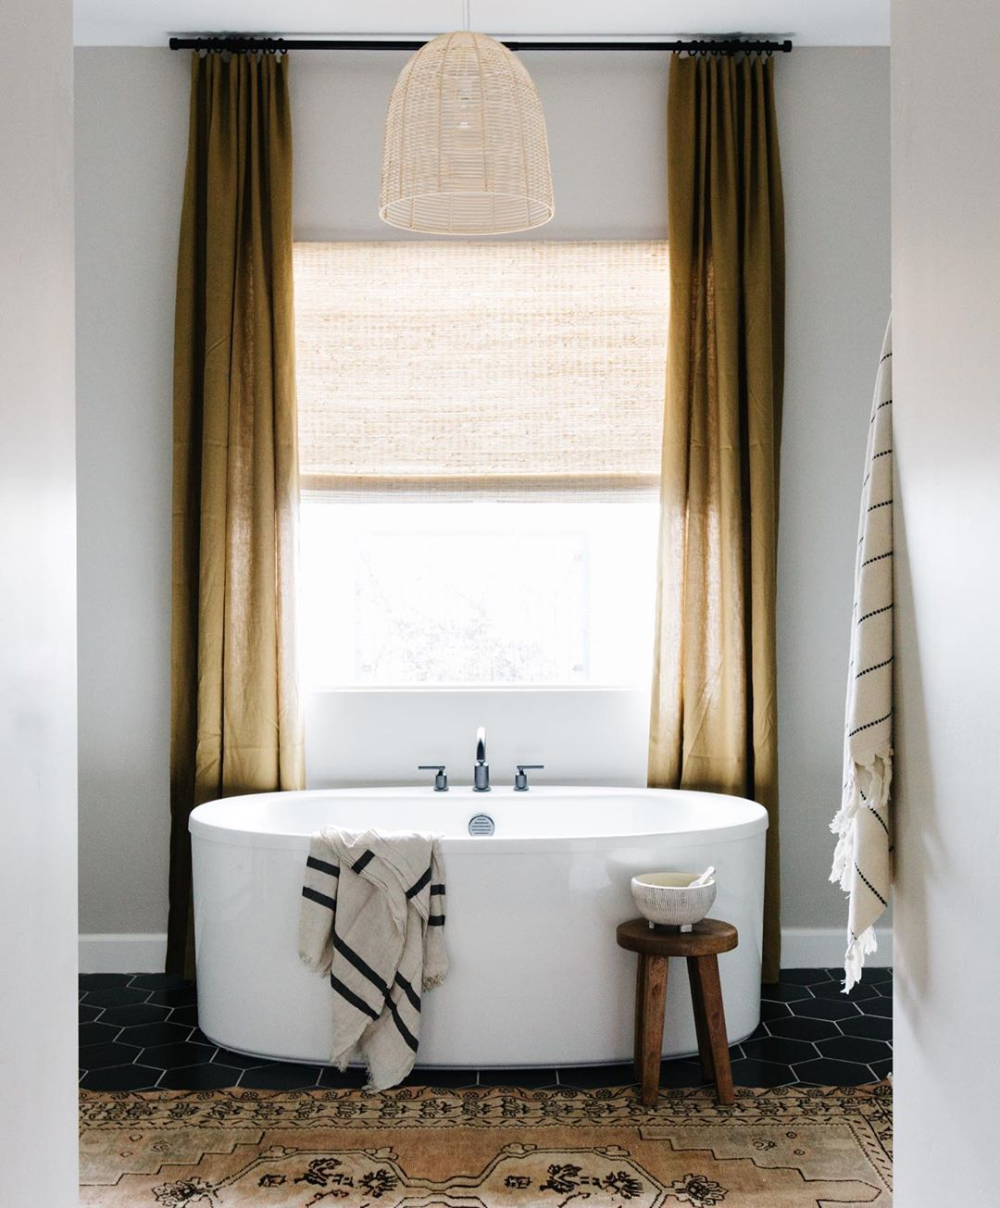 Lifestyledco Eclectic Bathroom Eclectic Bathroom Design Modern